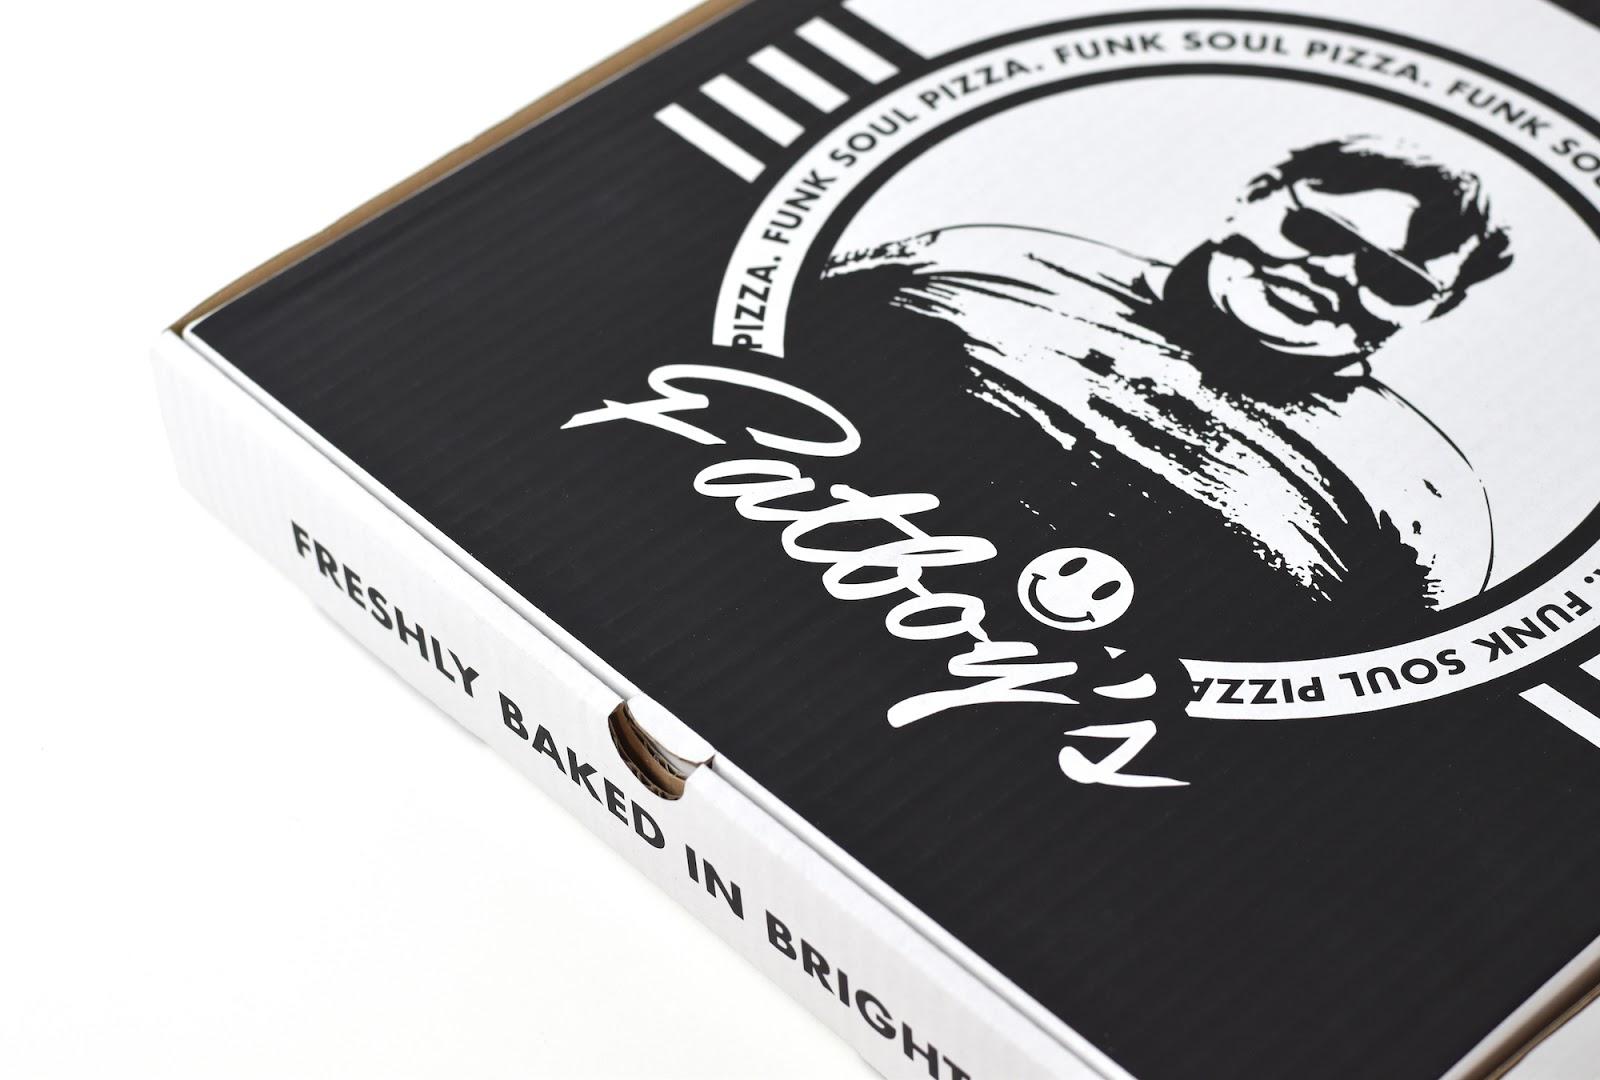 fatboy-slim_pizza-box_packshot_4